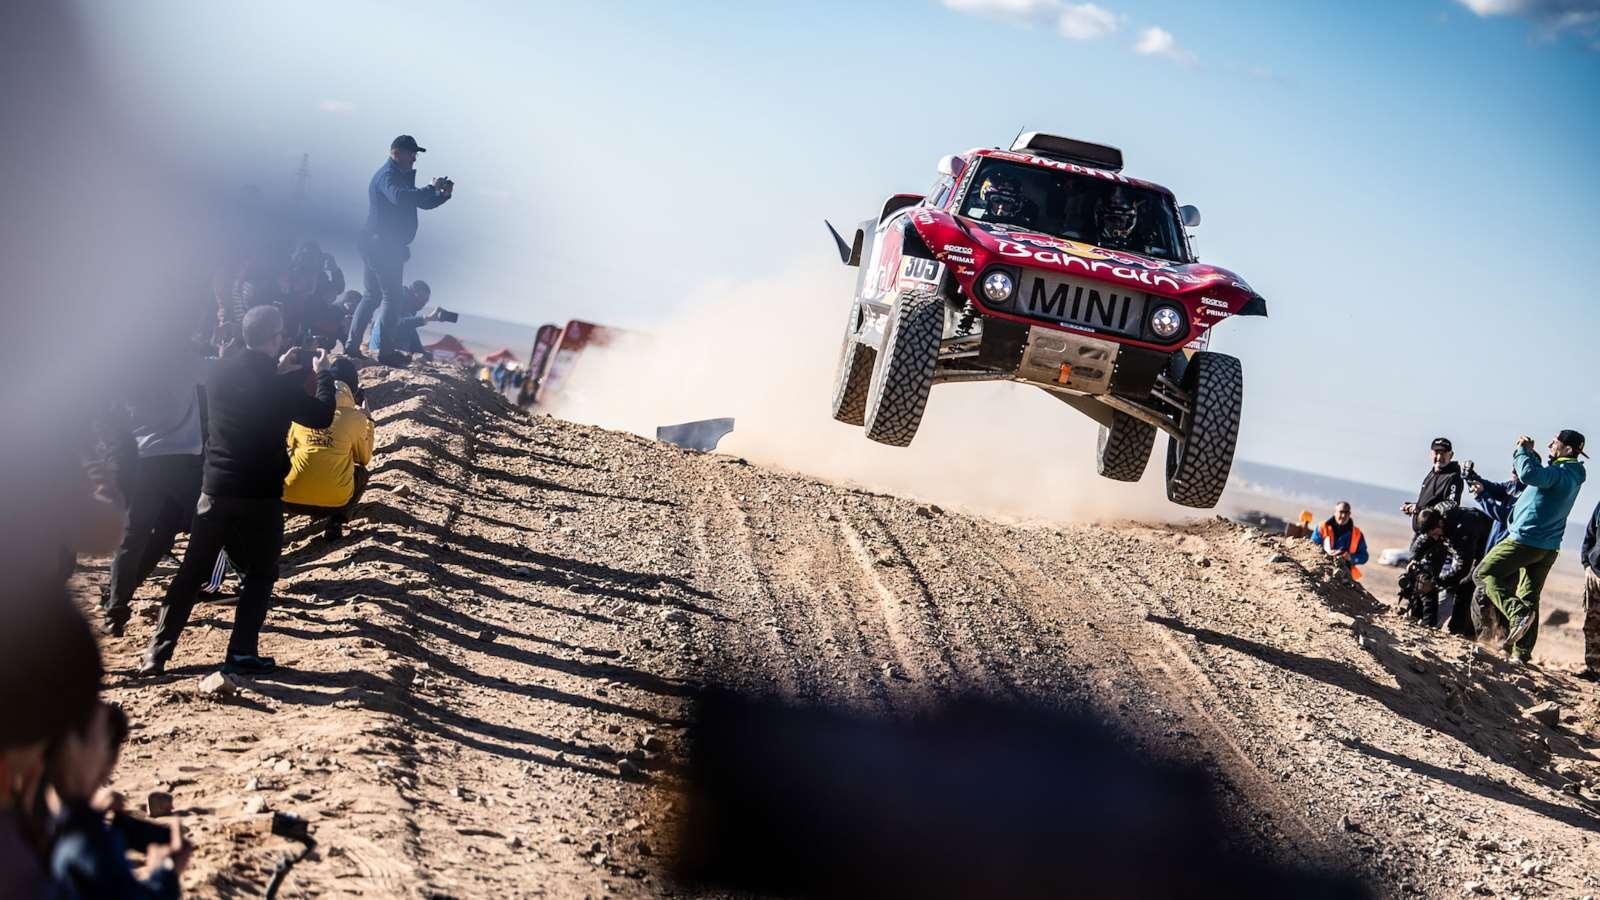 Carlos Sainz Sr wins the 2020 Dakar claiming third Dakar crown GRR 1600x900